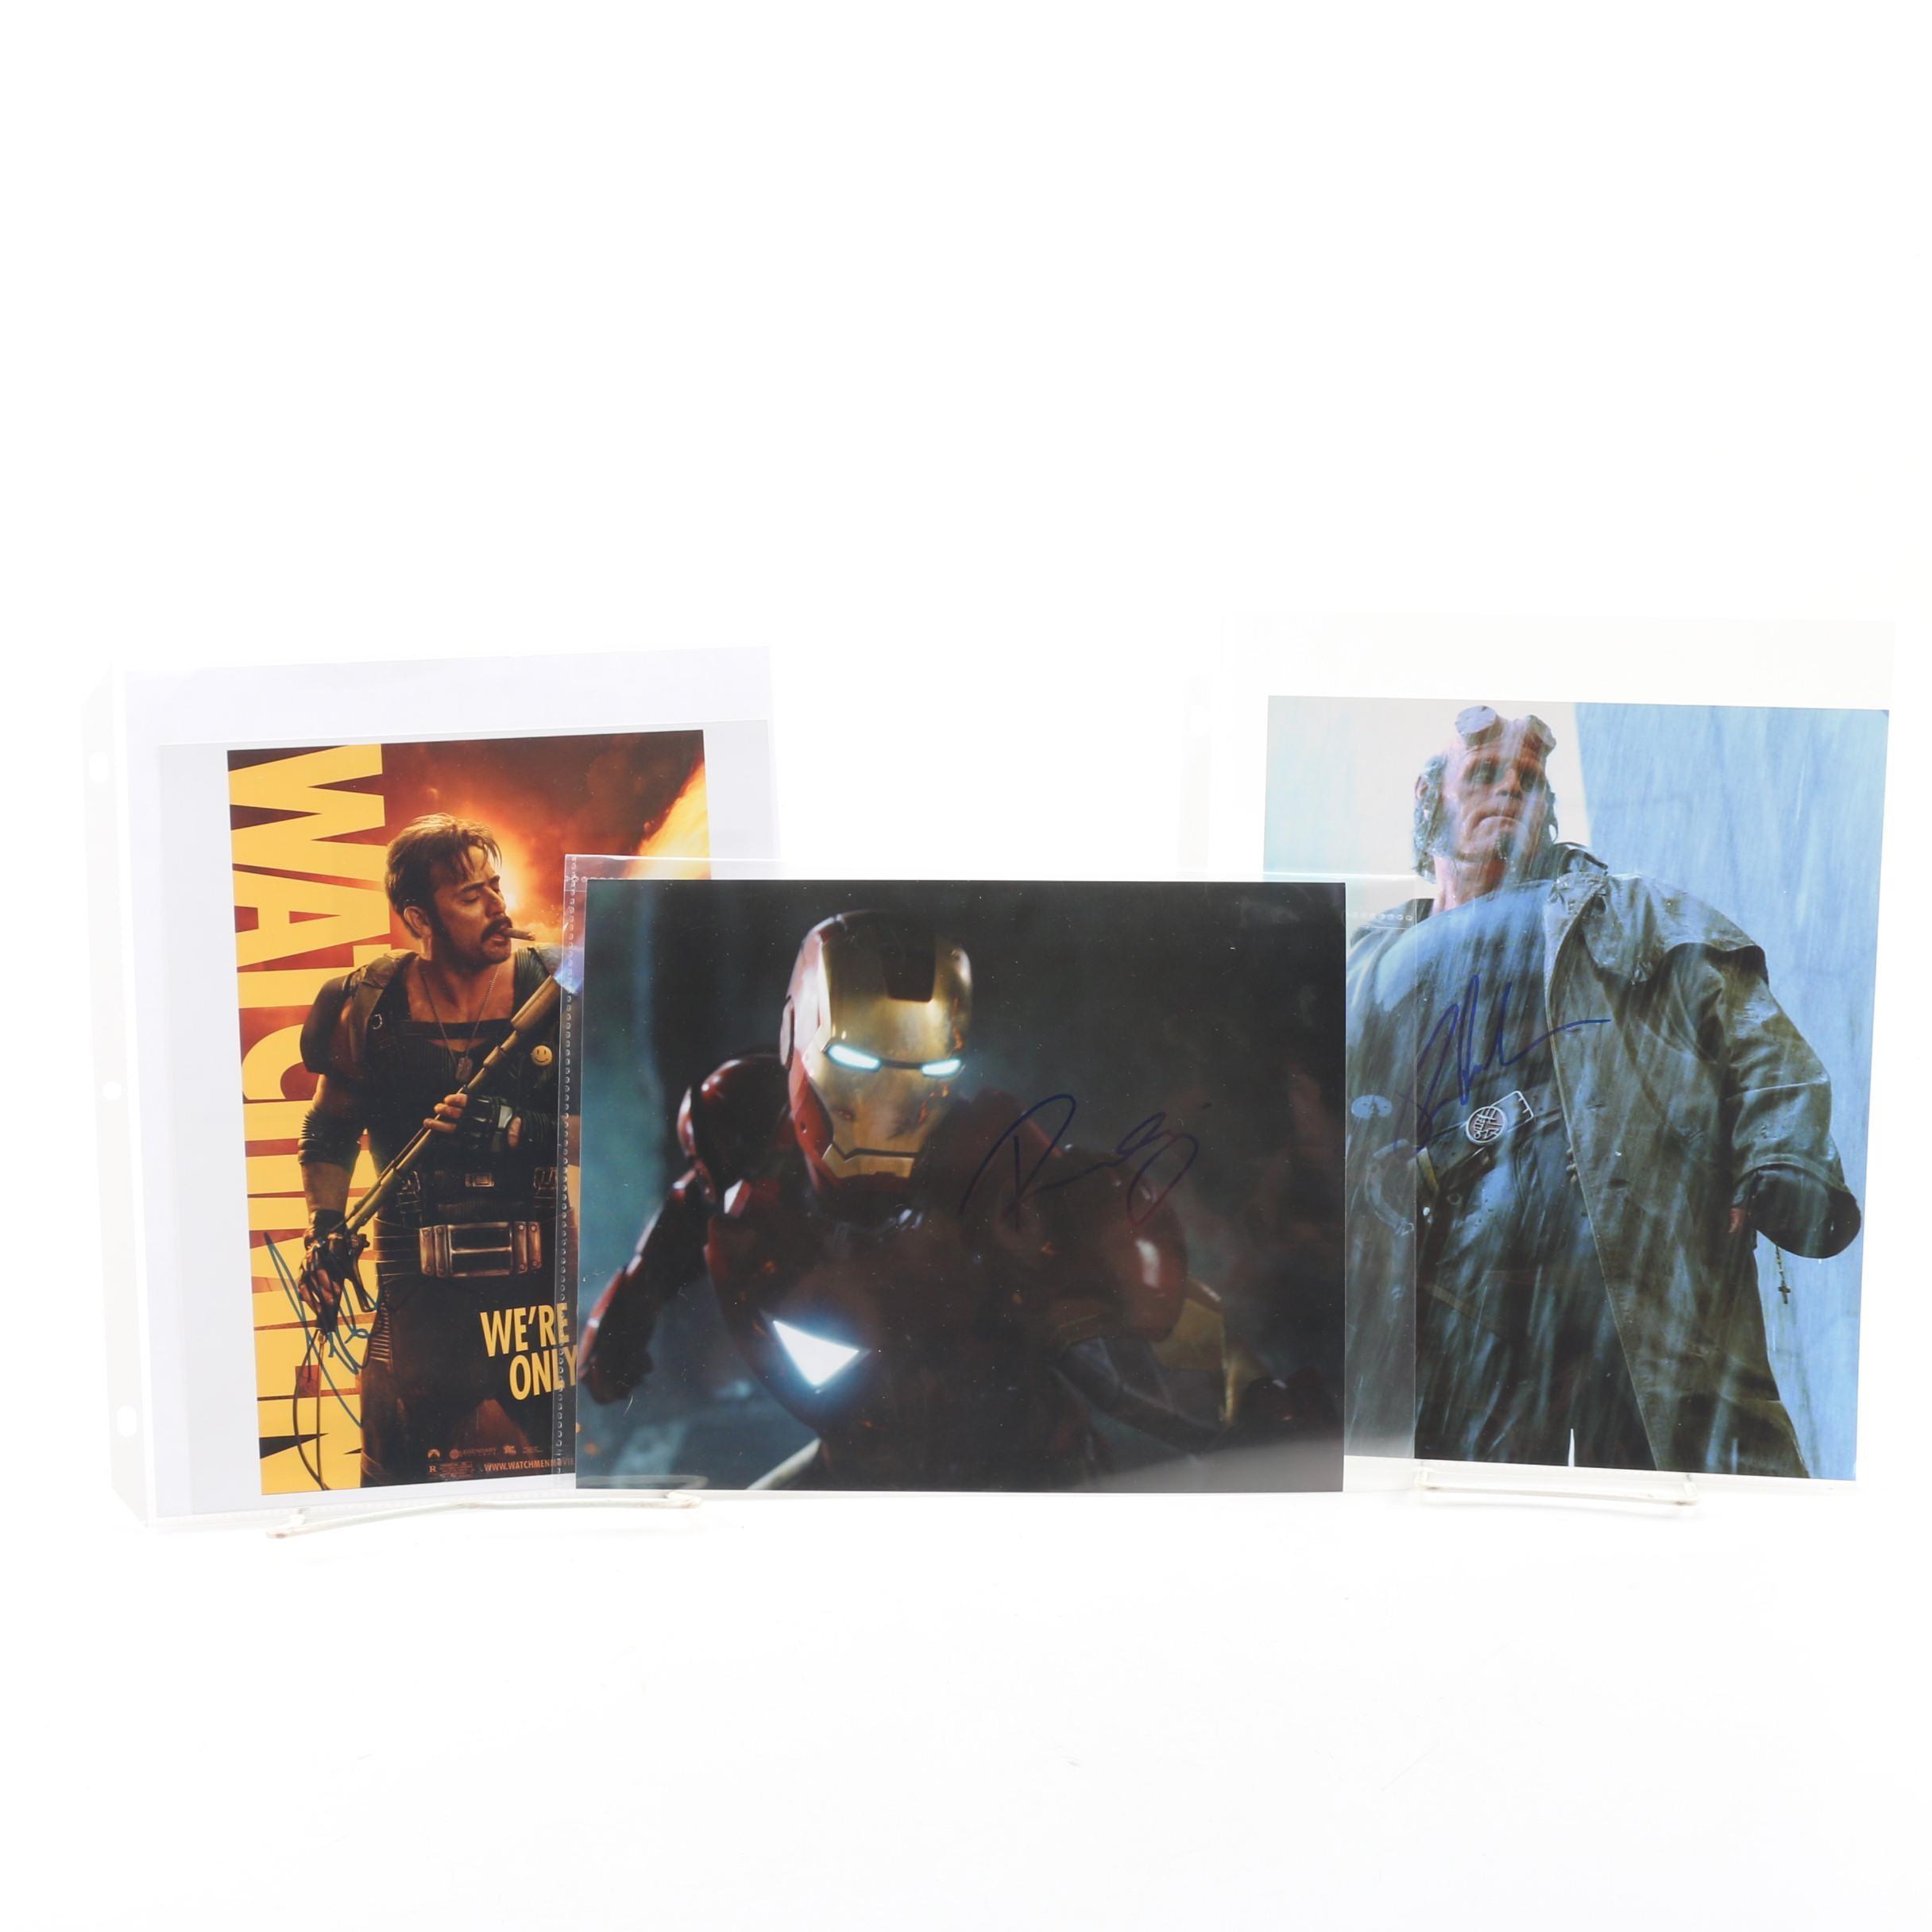 Robert Downey Jr., Jeffrey Dean Morgan, and Ron Perlman Autographs